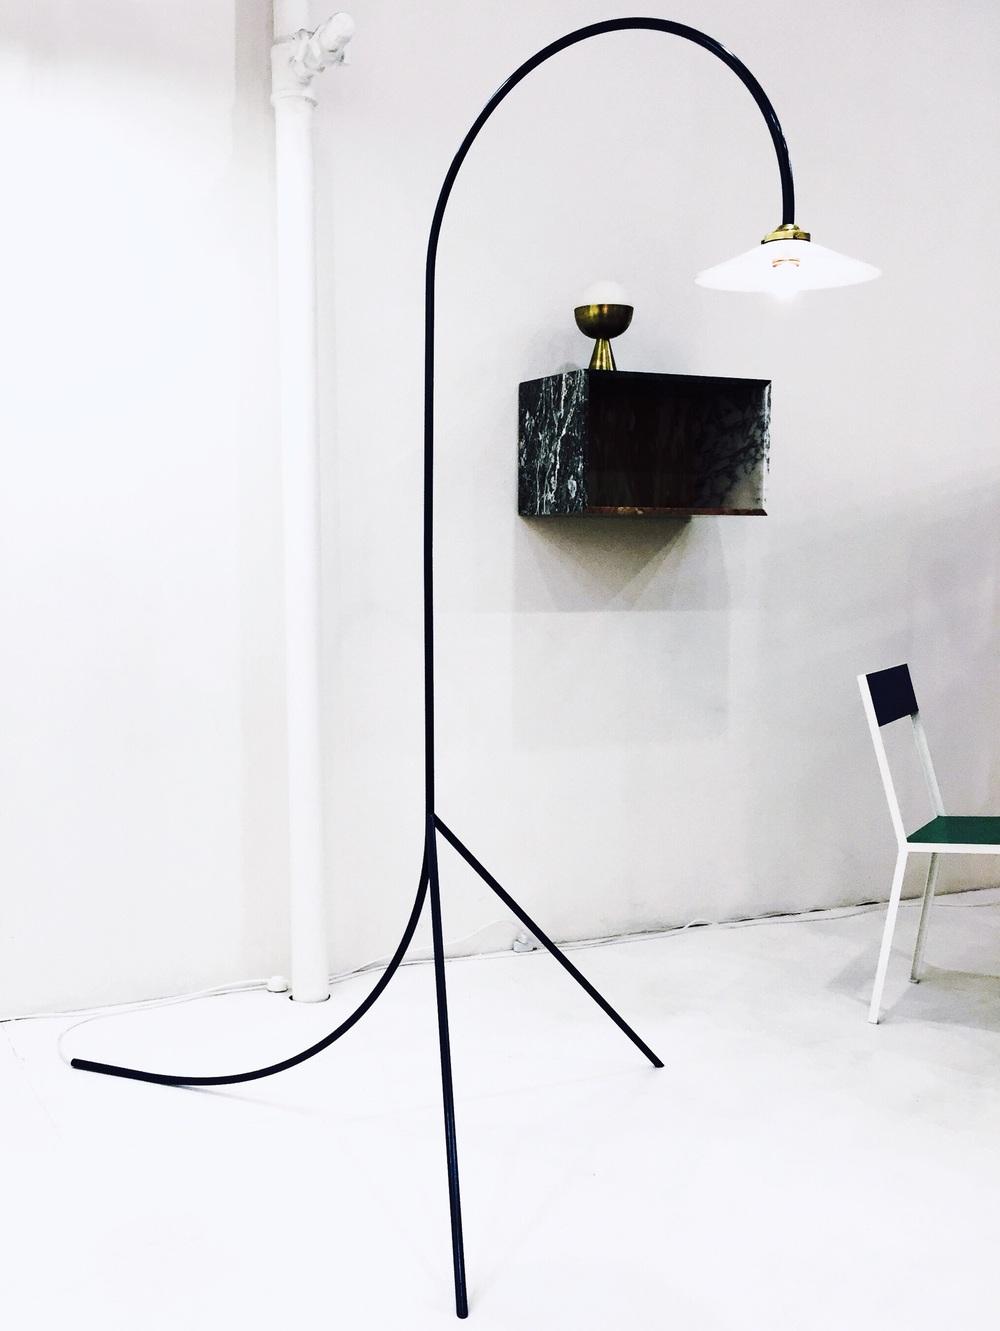 standing lamp No. 1